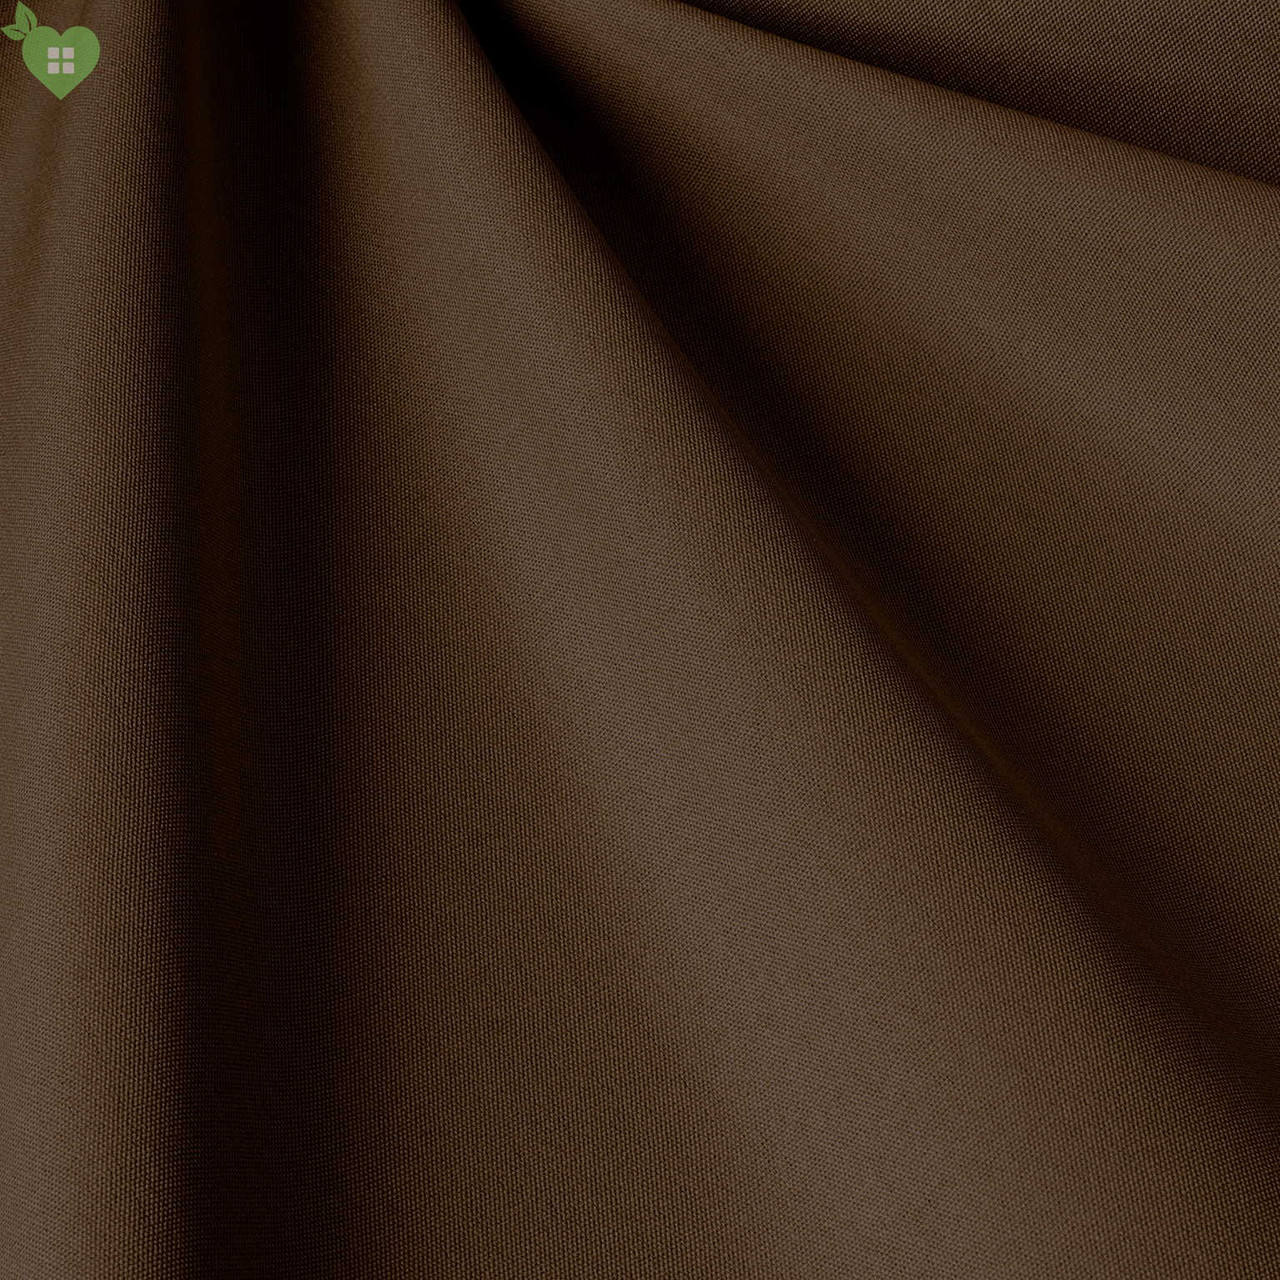 Ткань для улицы: Дралон (Outdoor) 400333v15